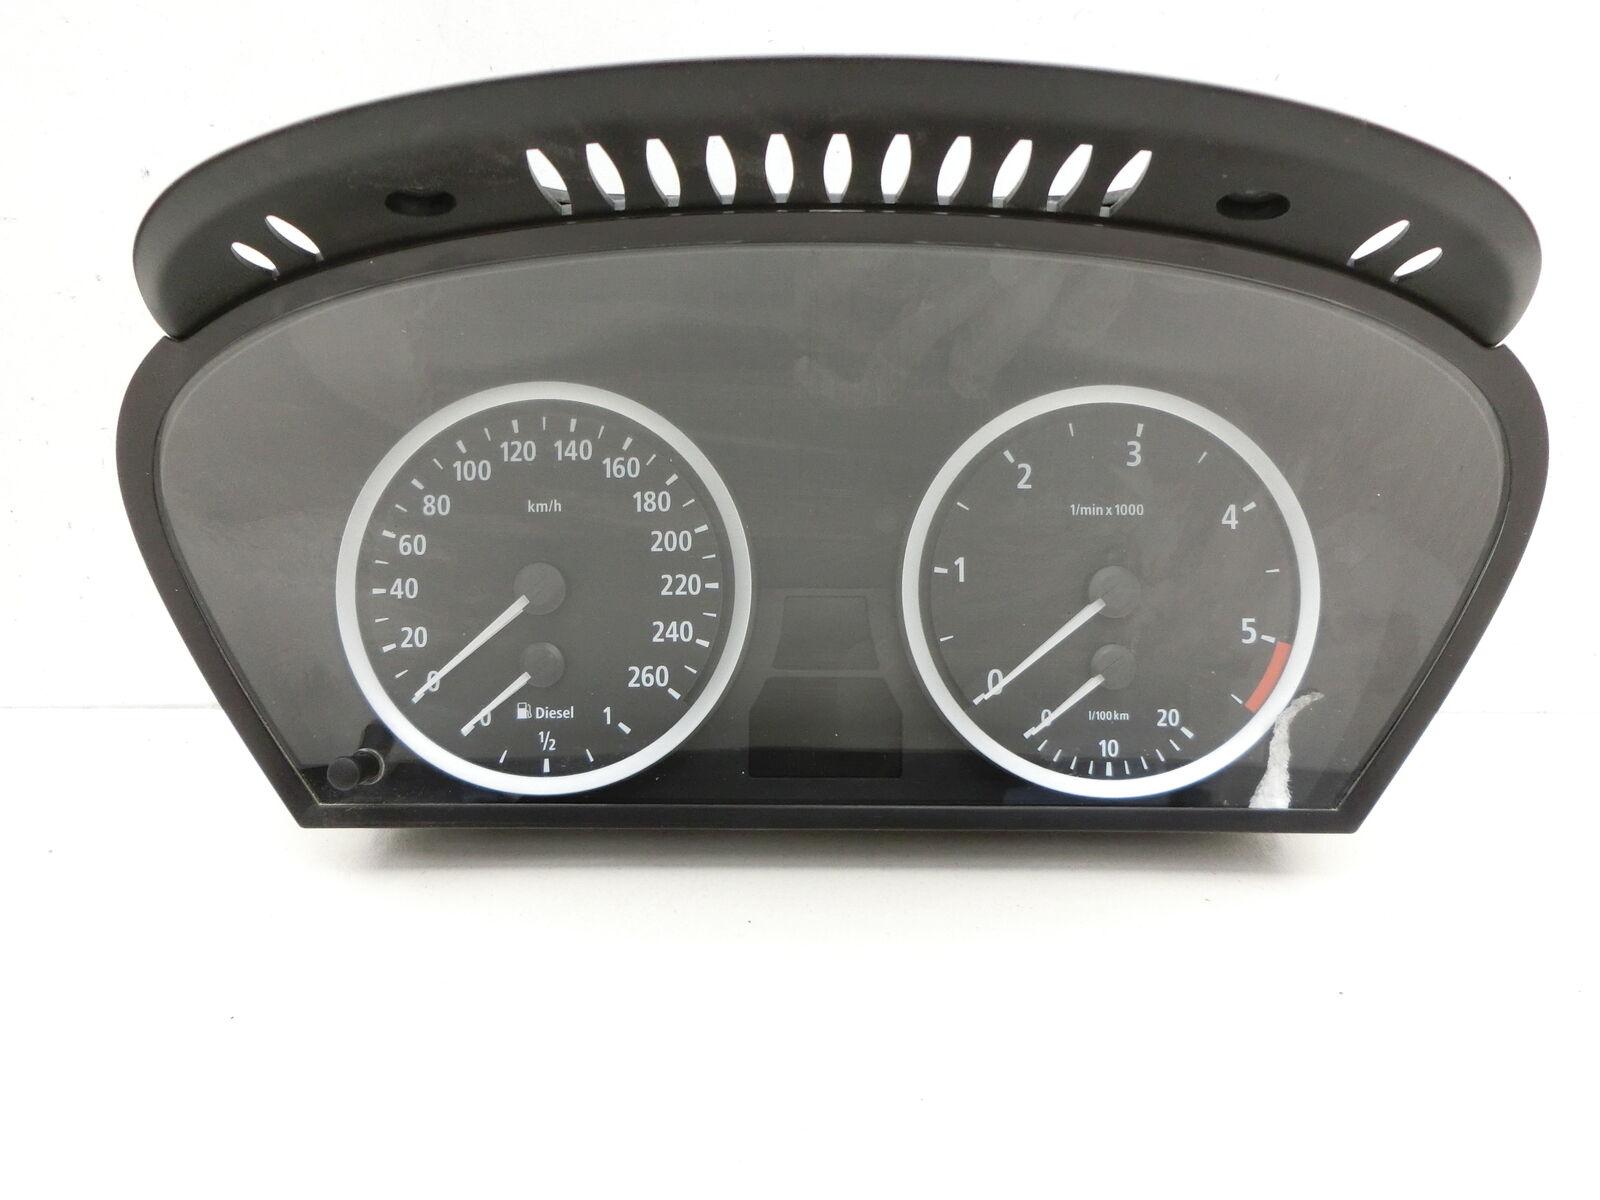 Kombiinstrument Tacho für BMW E61 530d 04 07 3 0d 160KW